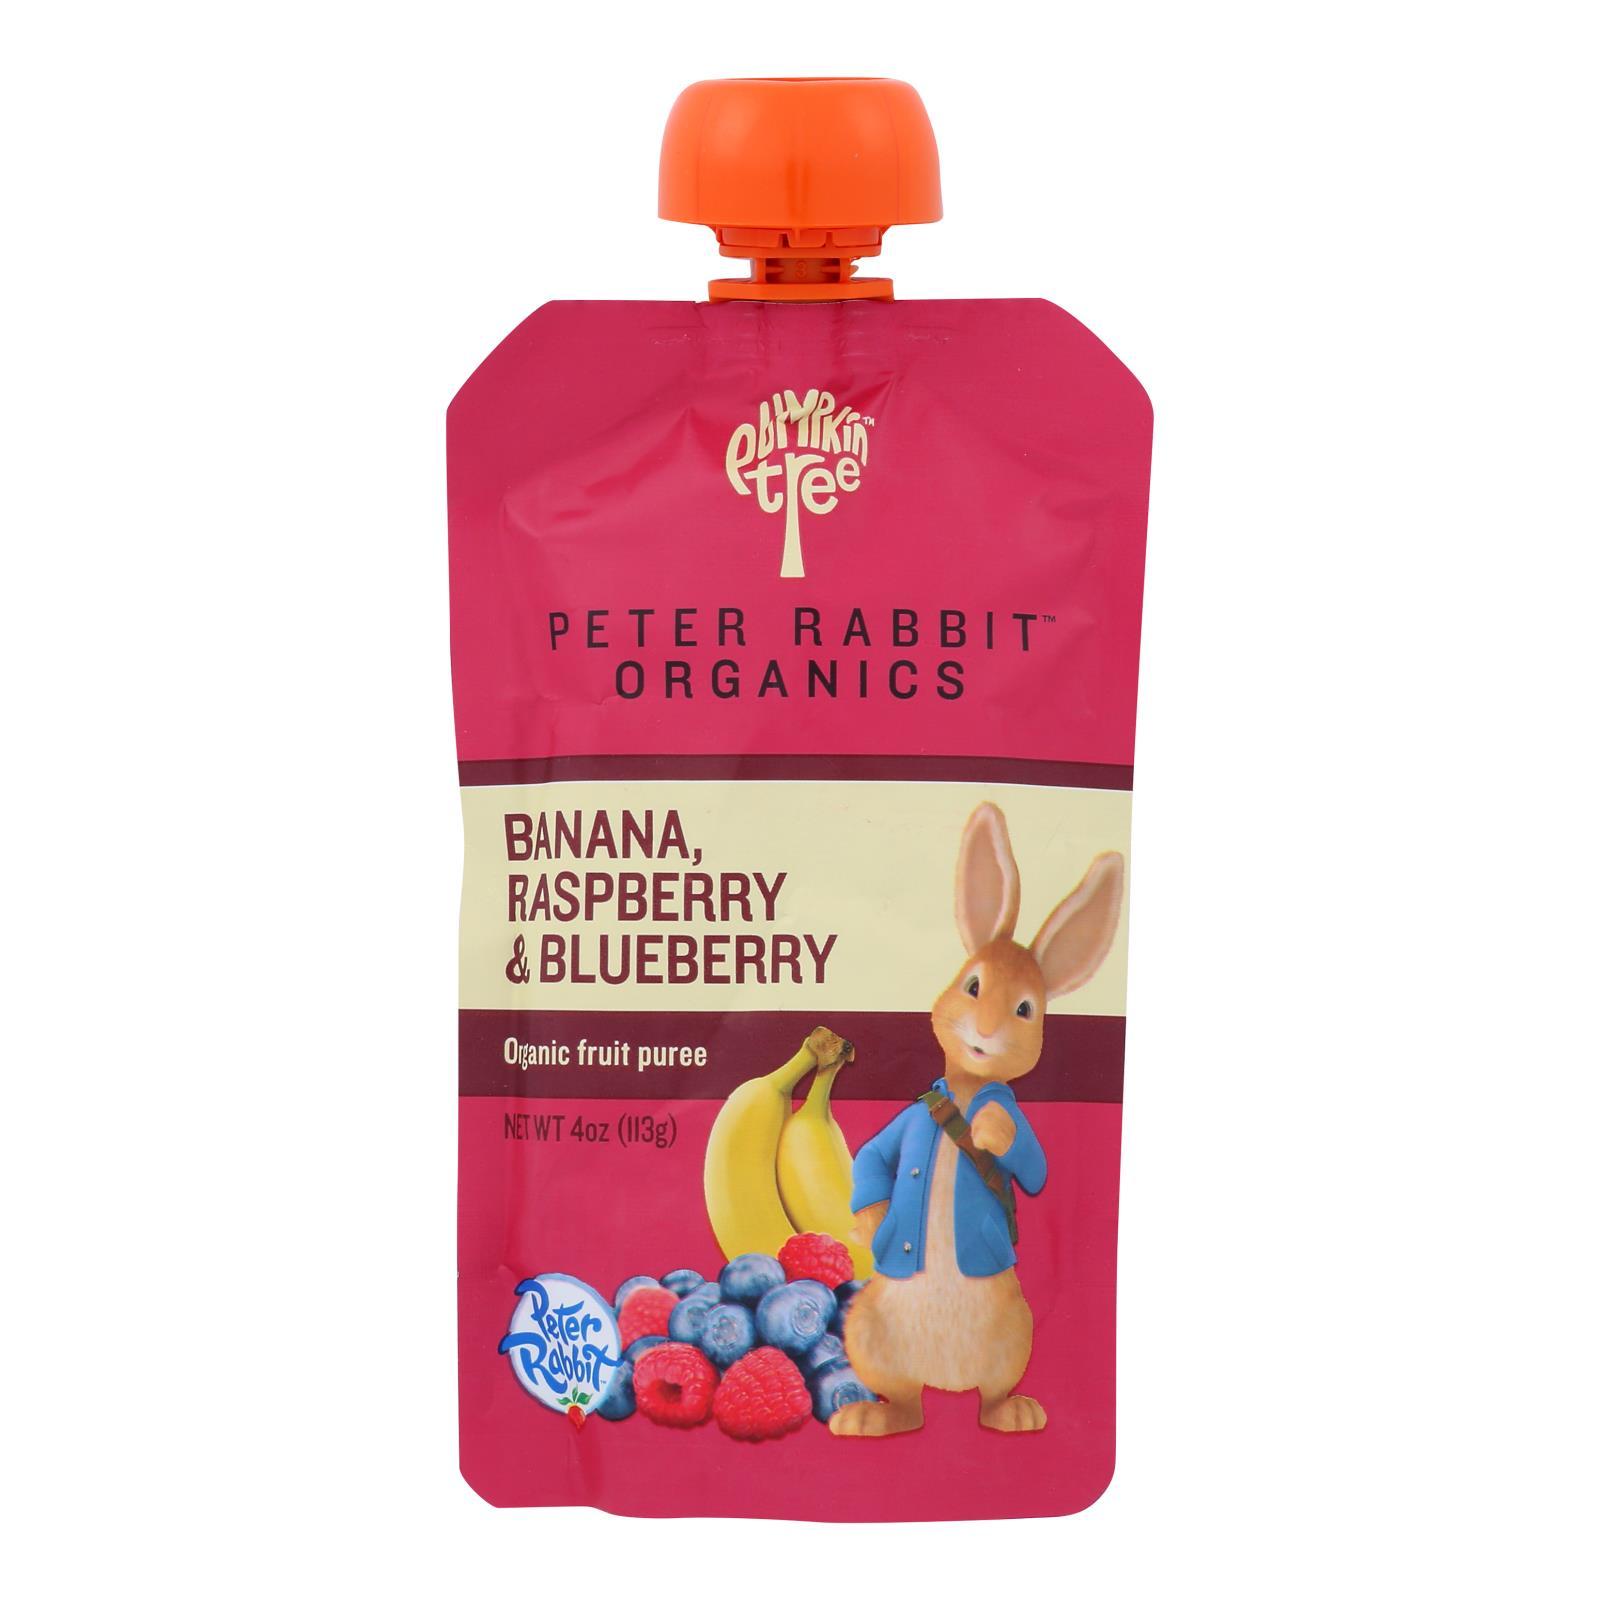 Peter Rabbit Organics Fruit Snacks - Raspberry Banana and Blueberry - Case of 10 - 4 oz.